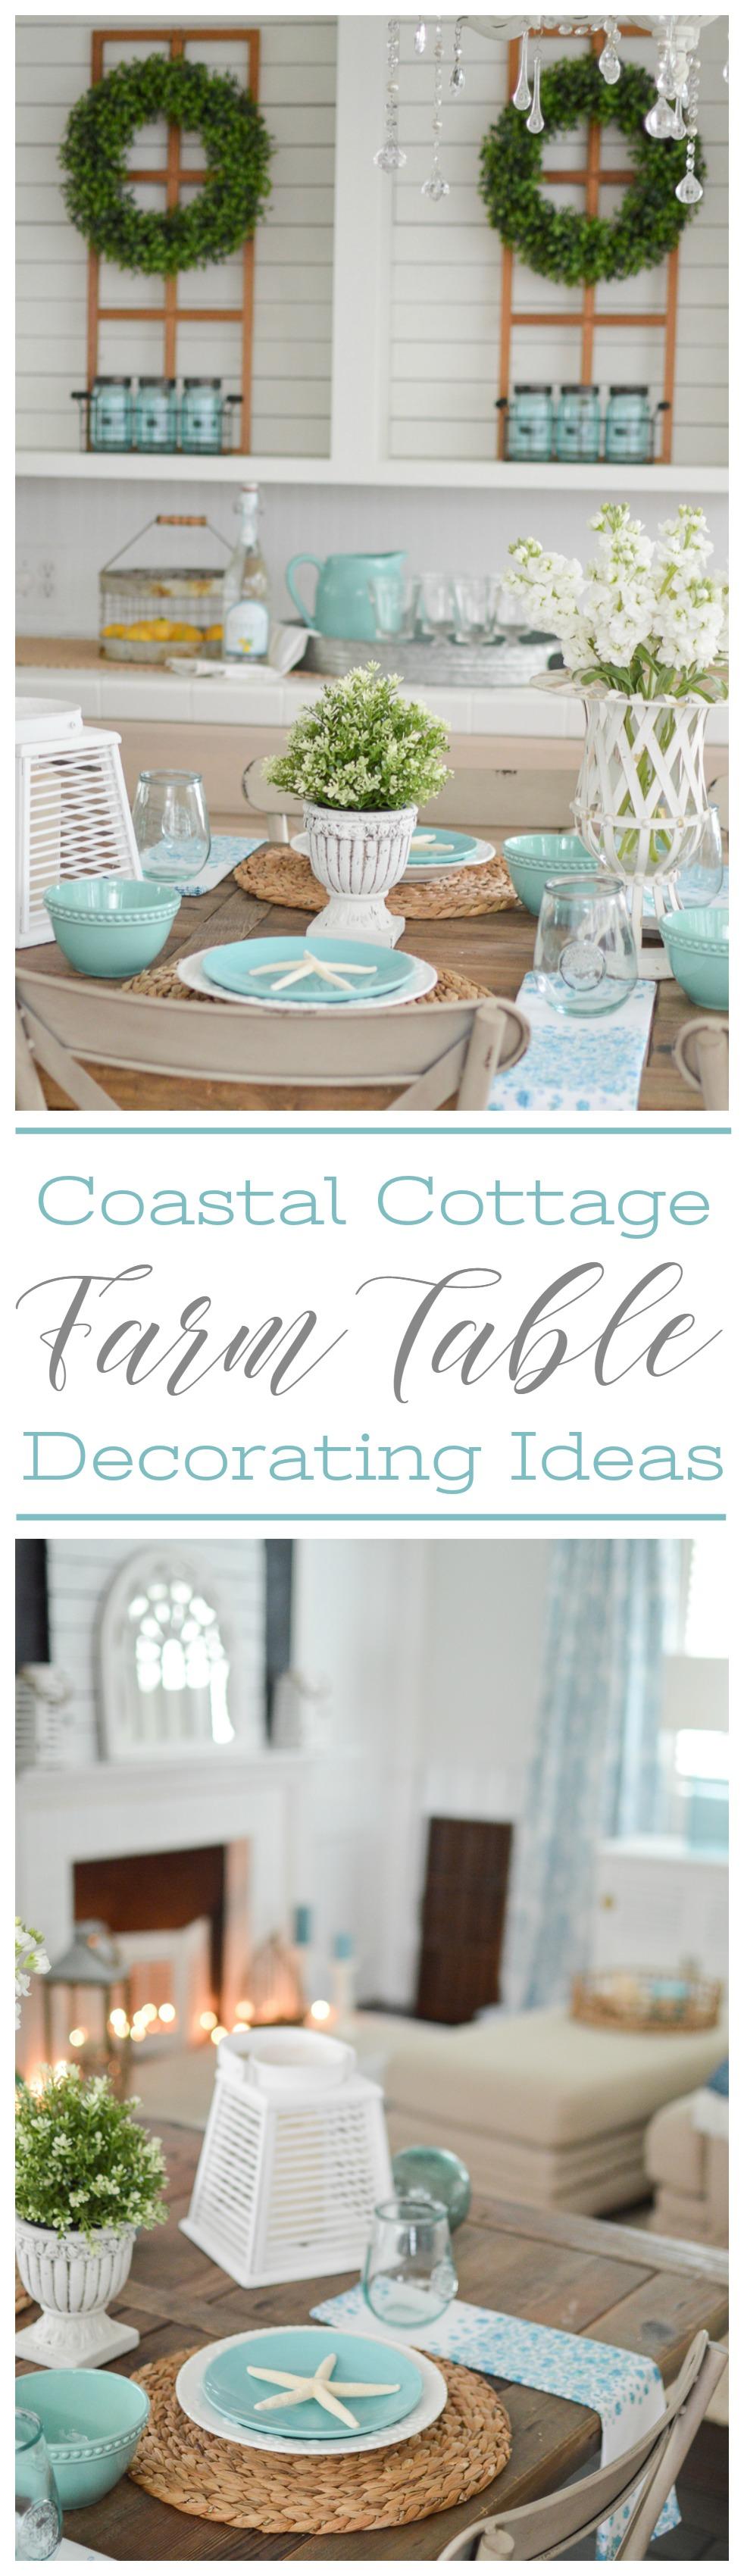 Coastal Cottage Farm Table Decorating Ideas - www.foxhollowcottage.com - Summer Tablescape